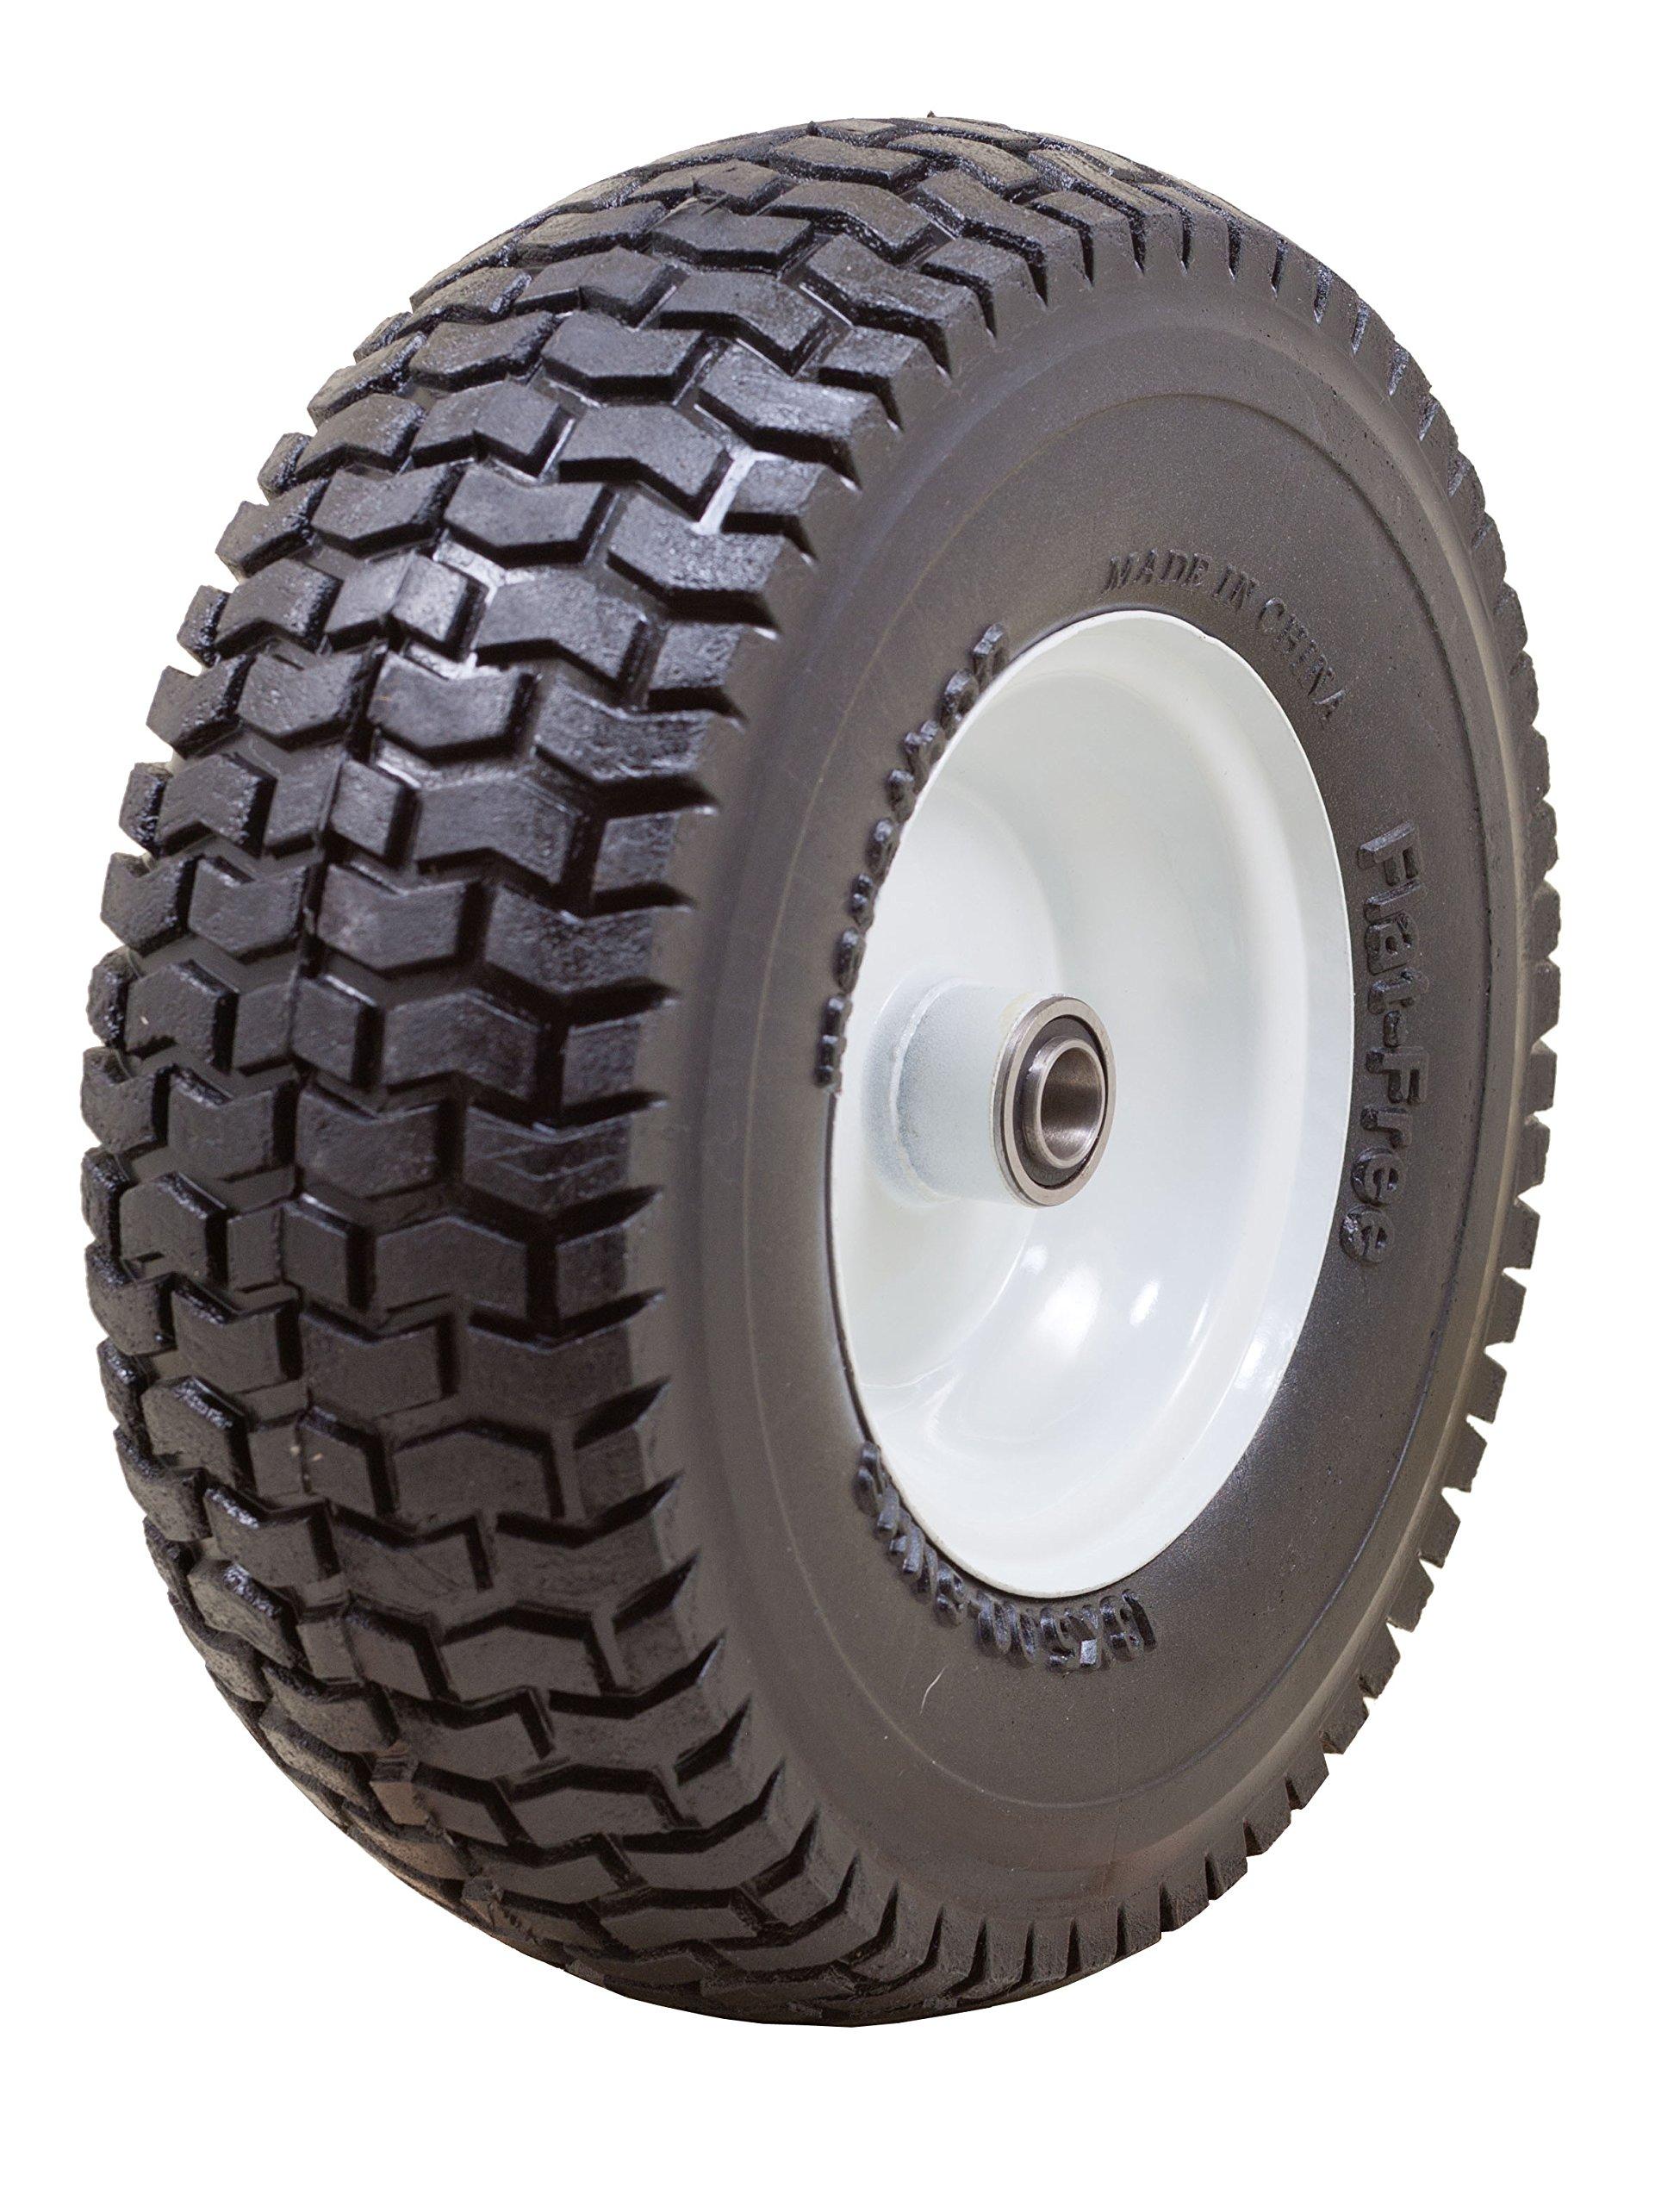 Marathon 13x5.00-6'' Flat Free Tire on Wheel, 3'' Hub, 3/4'' Bearings